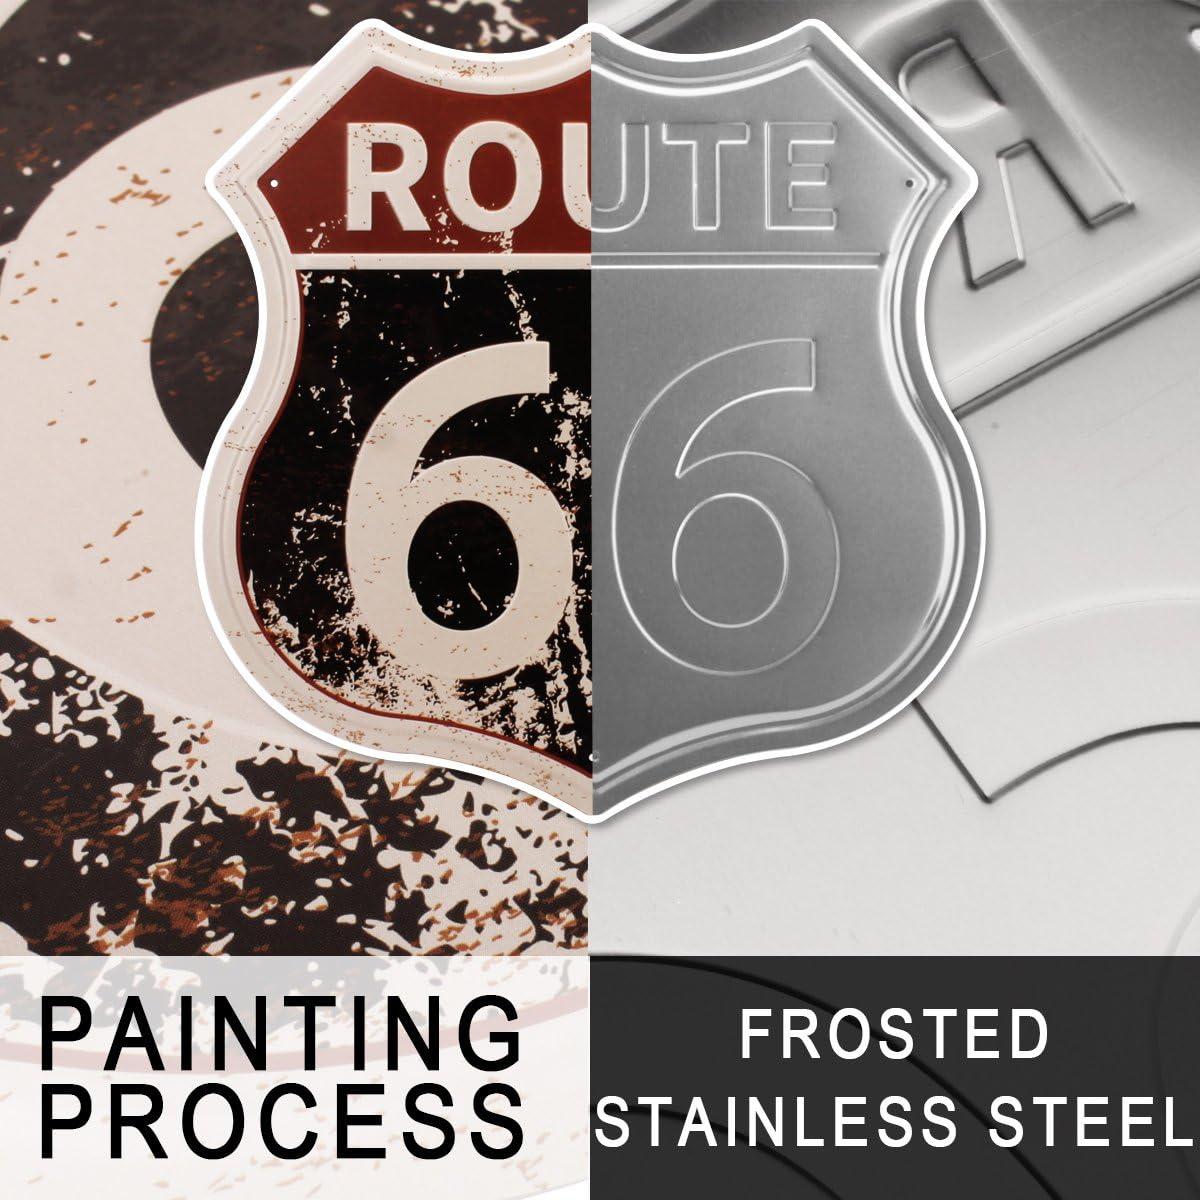 Amazon.com: HANTAJANSS Route 66 Signs Vintage Carteles para ...